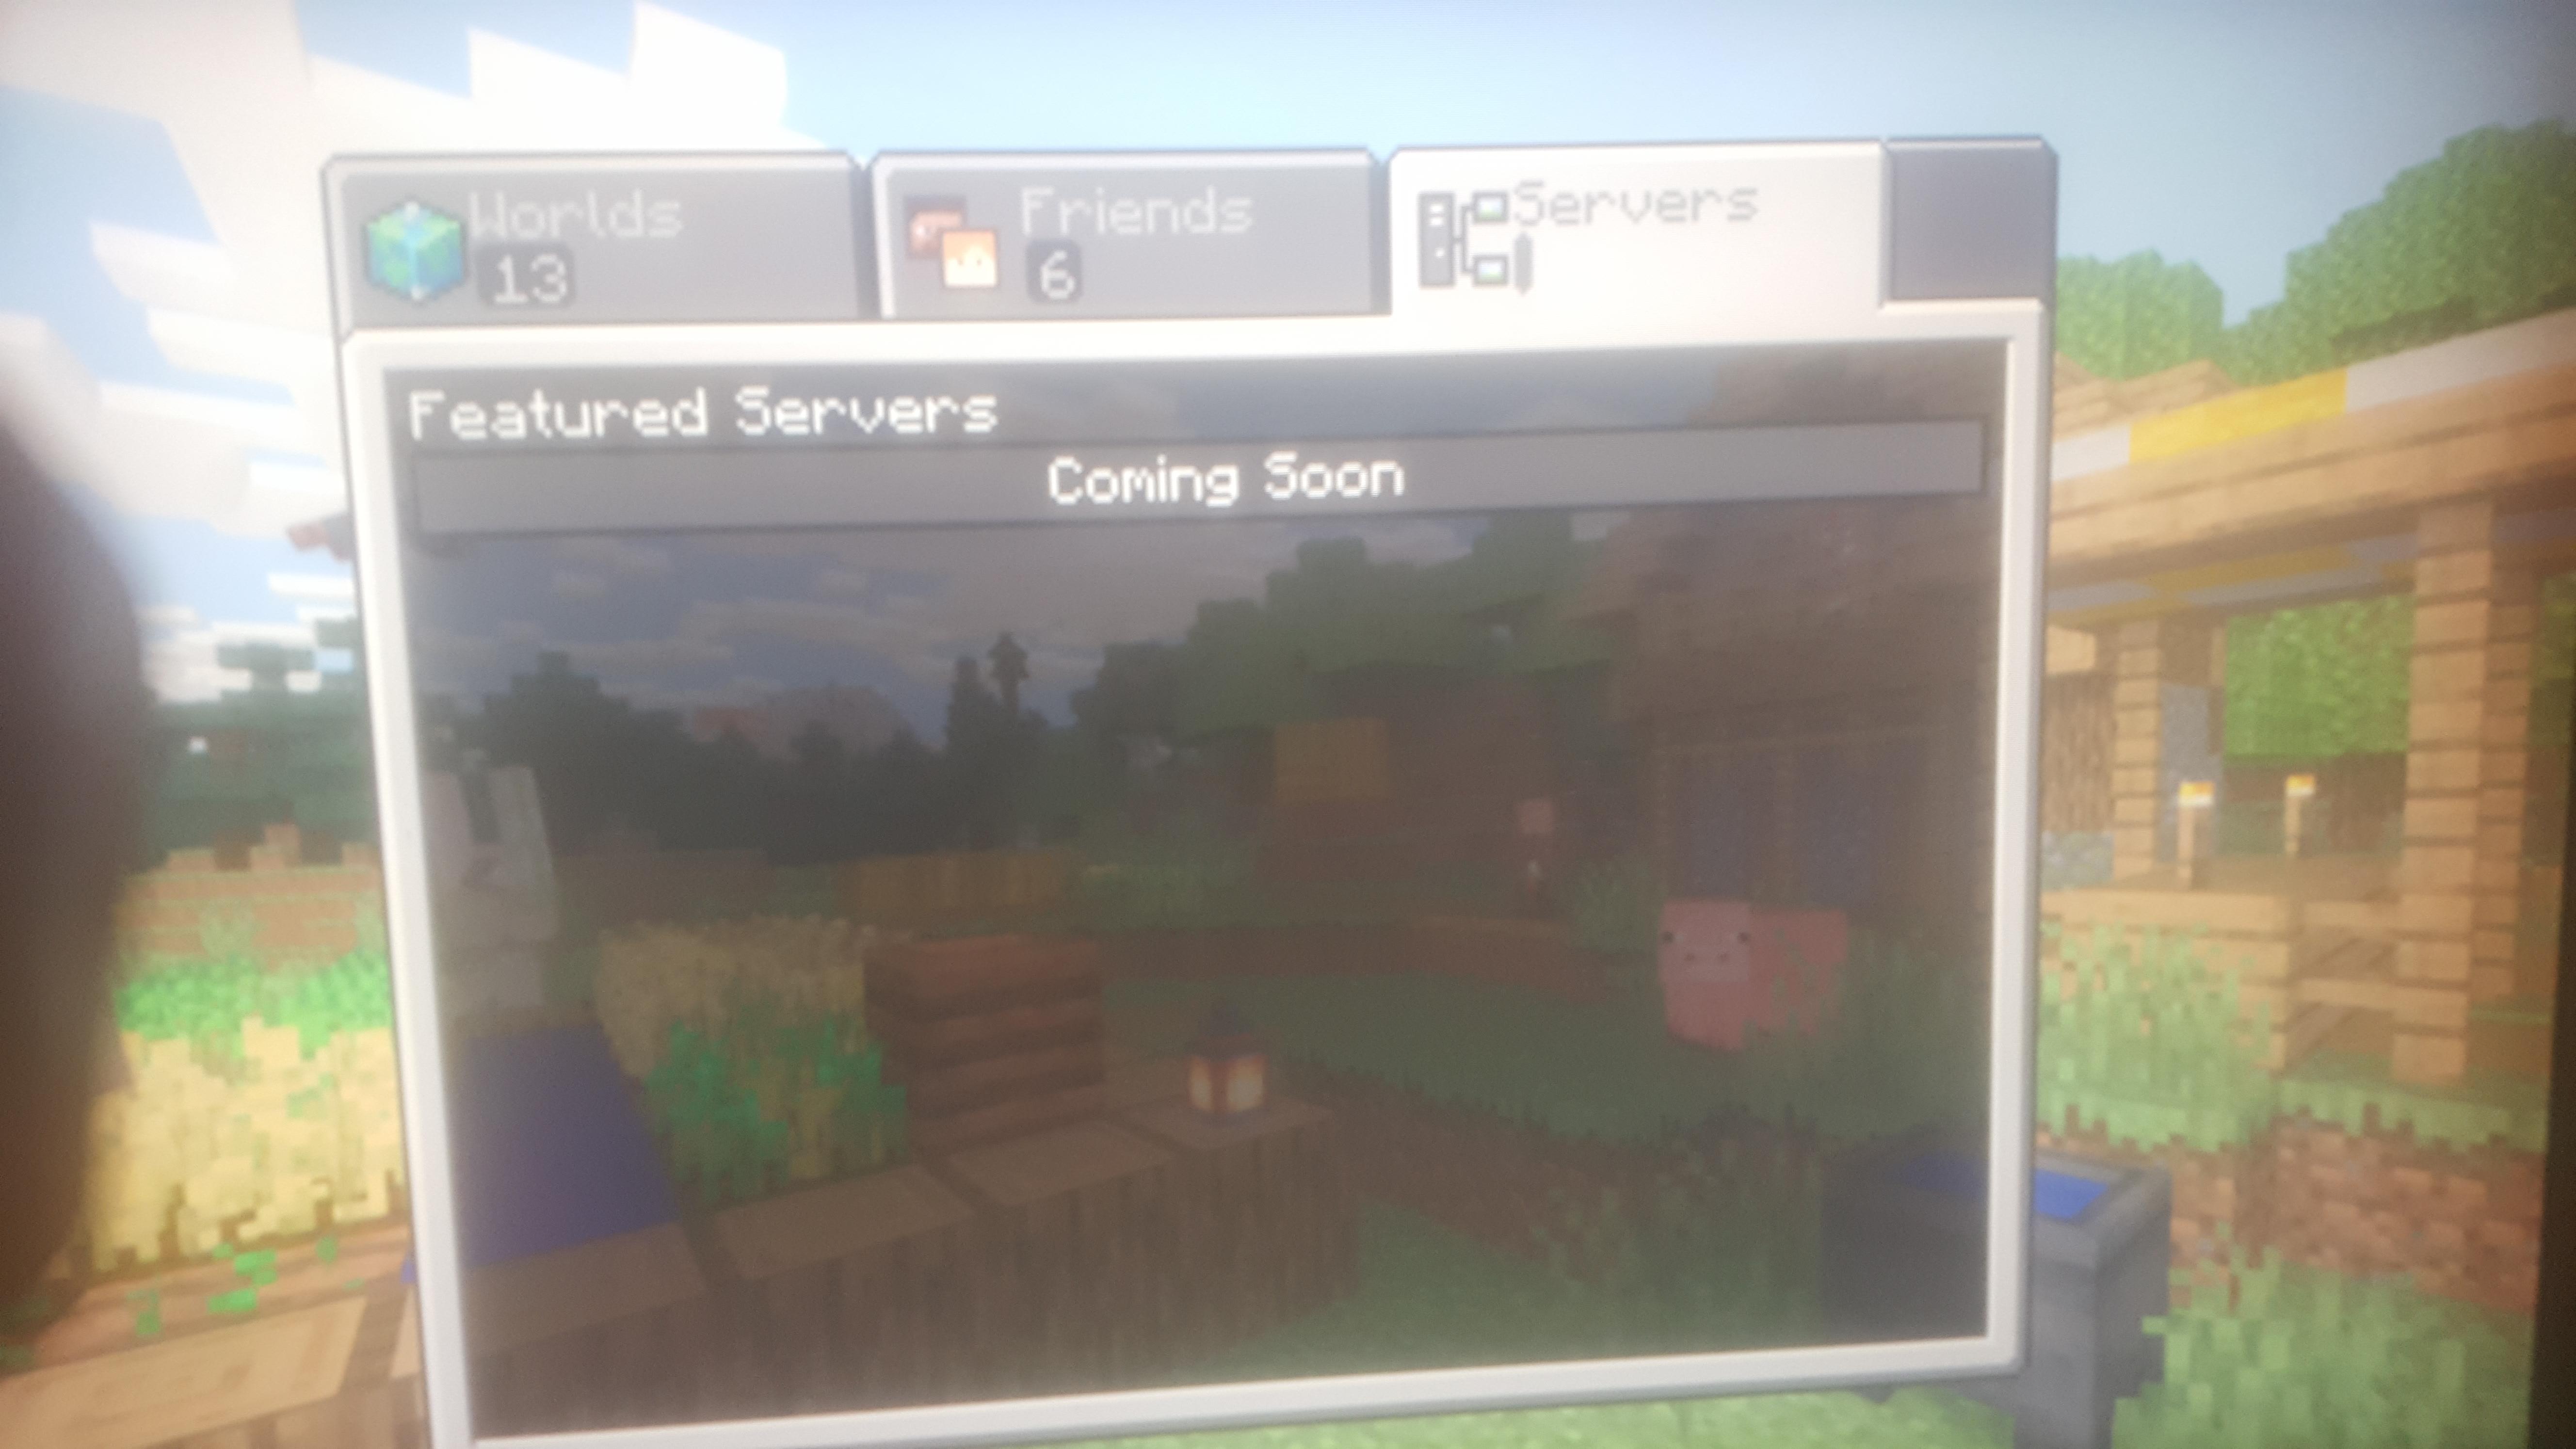 MCPE 55911 Featured Server List Says Coming soon Jira